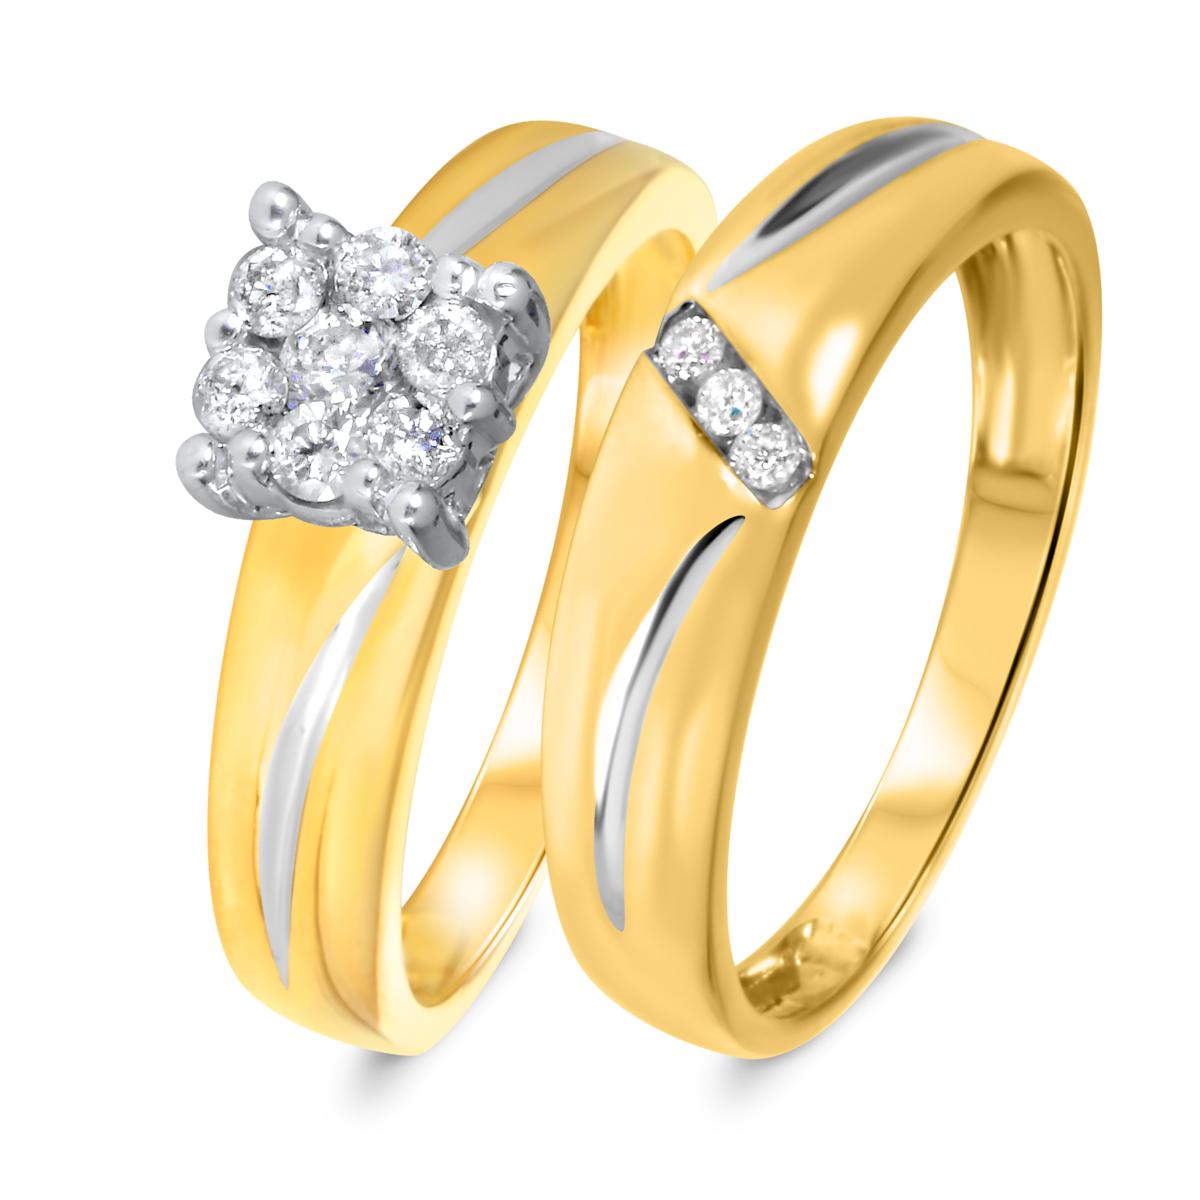 1/4 CT. T.W. Diamond Women's Bridal Wedding Ring Set 10K Yellow Gold